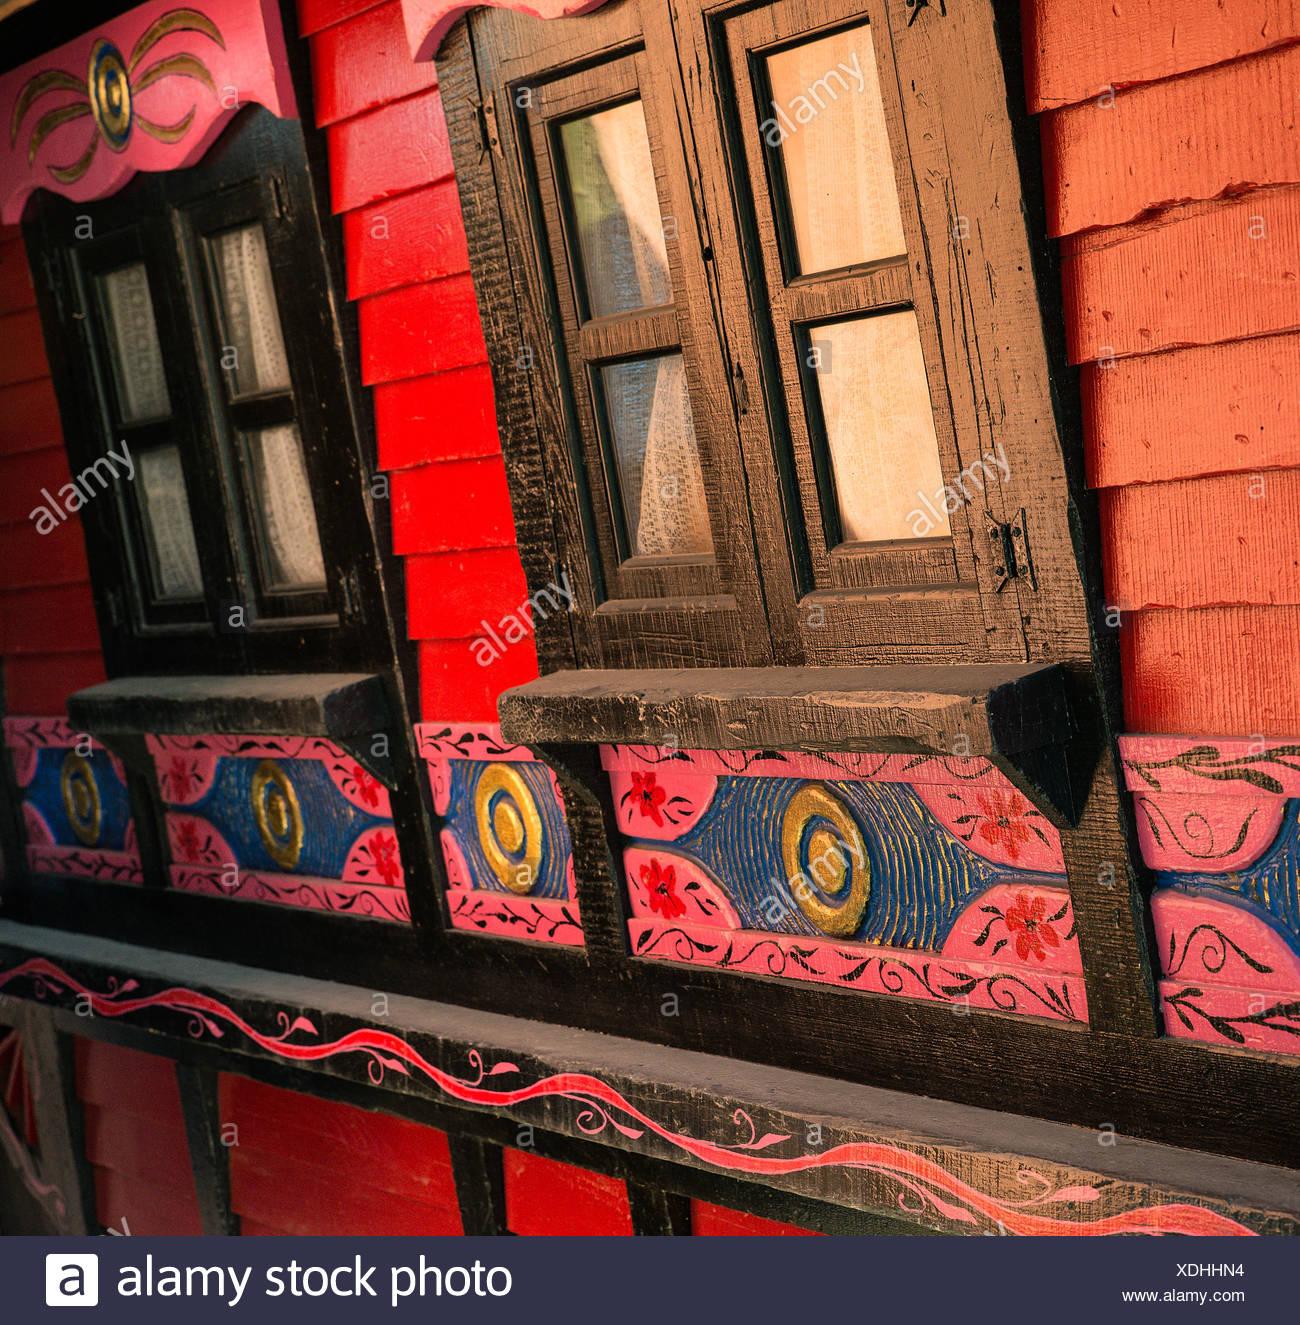 Gypsy caravan detail, Ireland - Stock Image